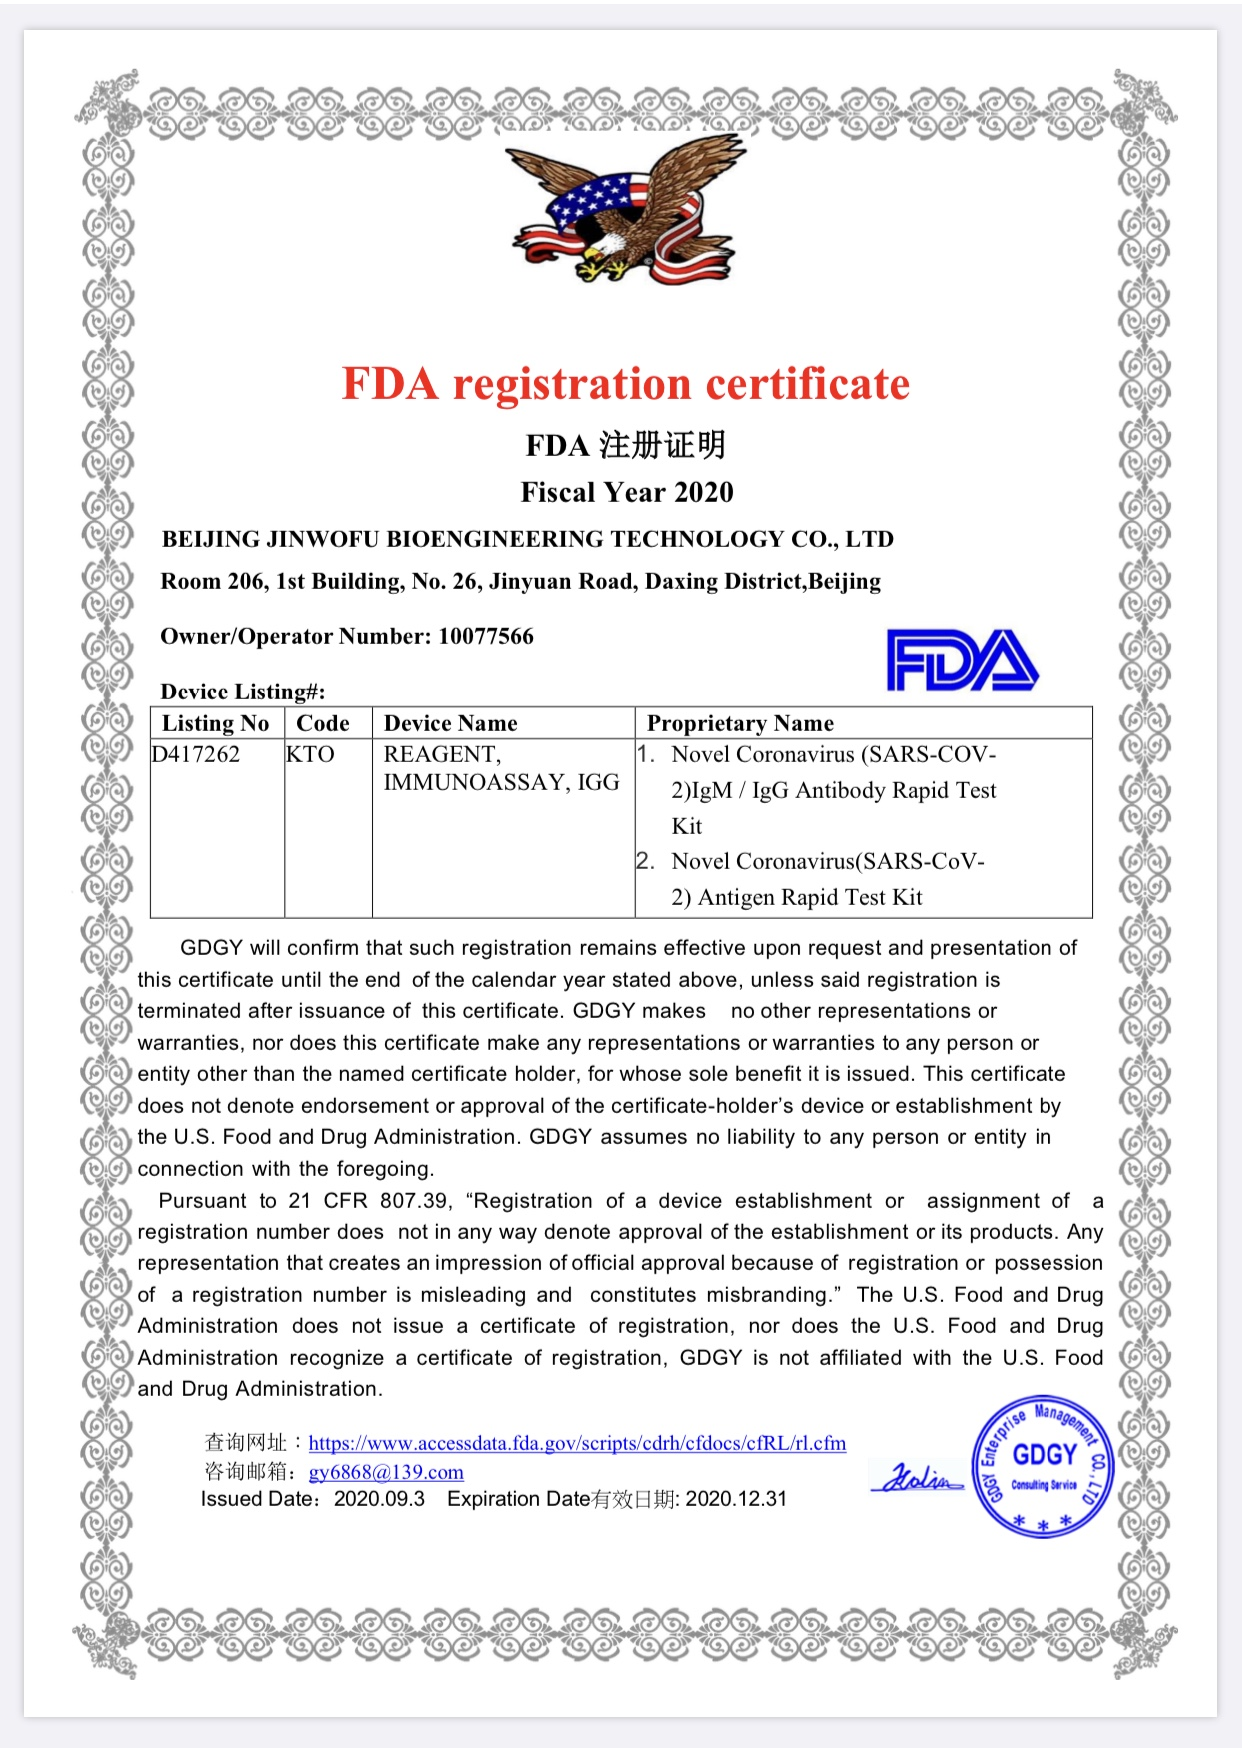 米国FDAの緊急使用認可(EUA)